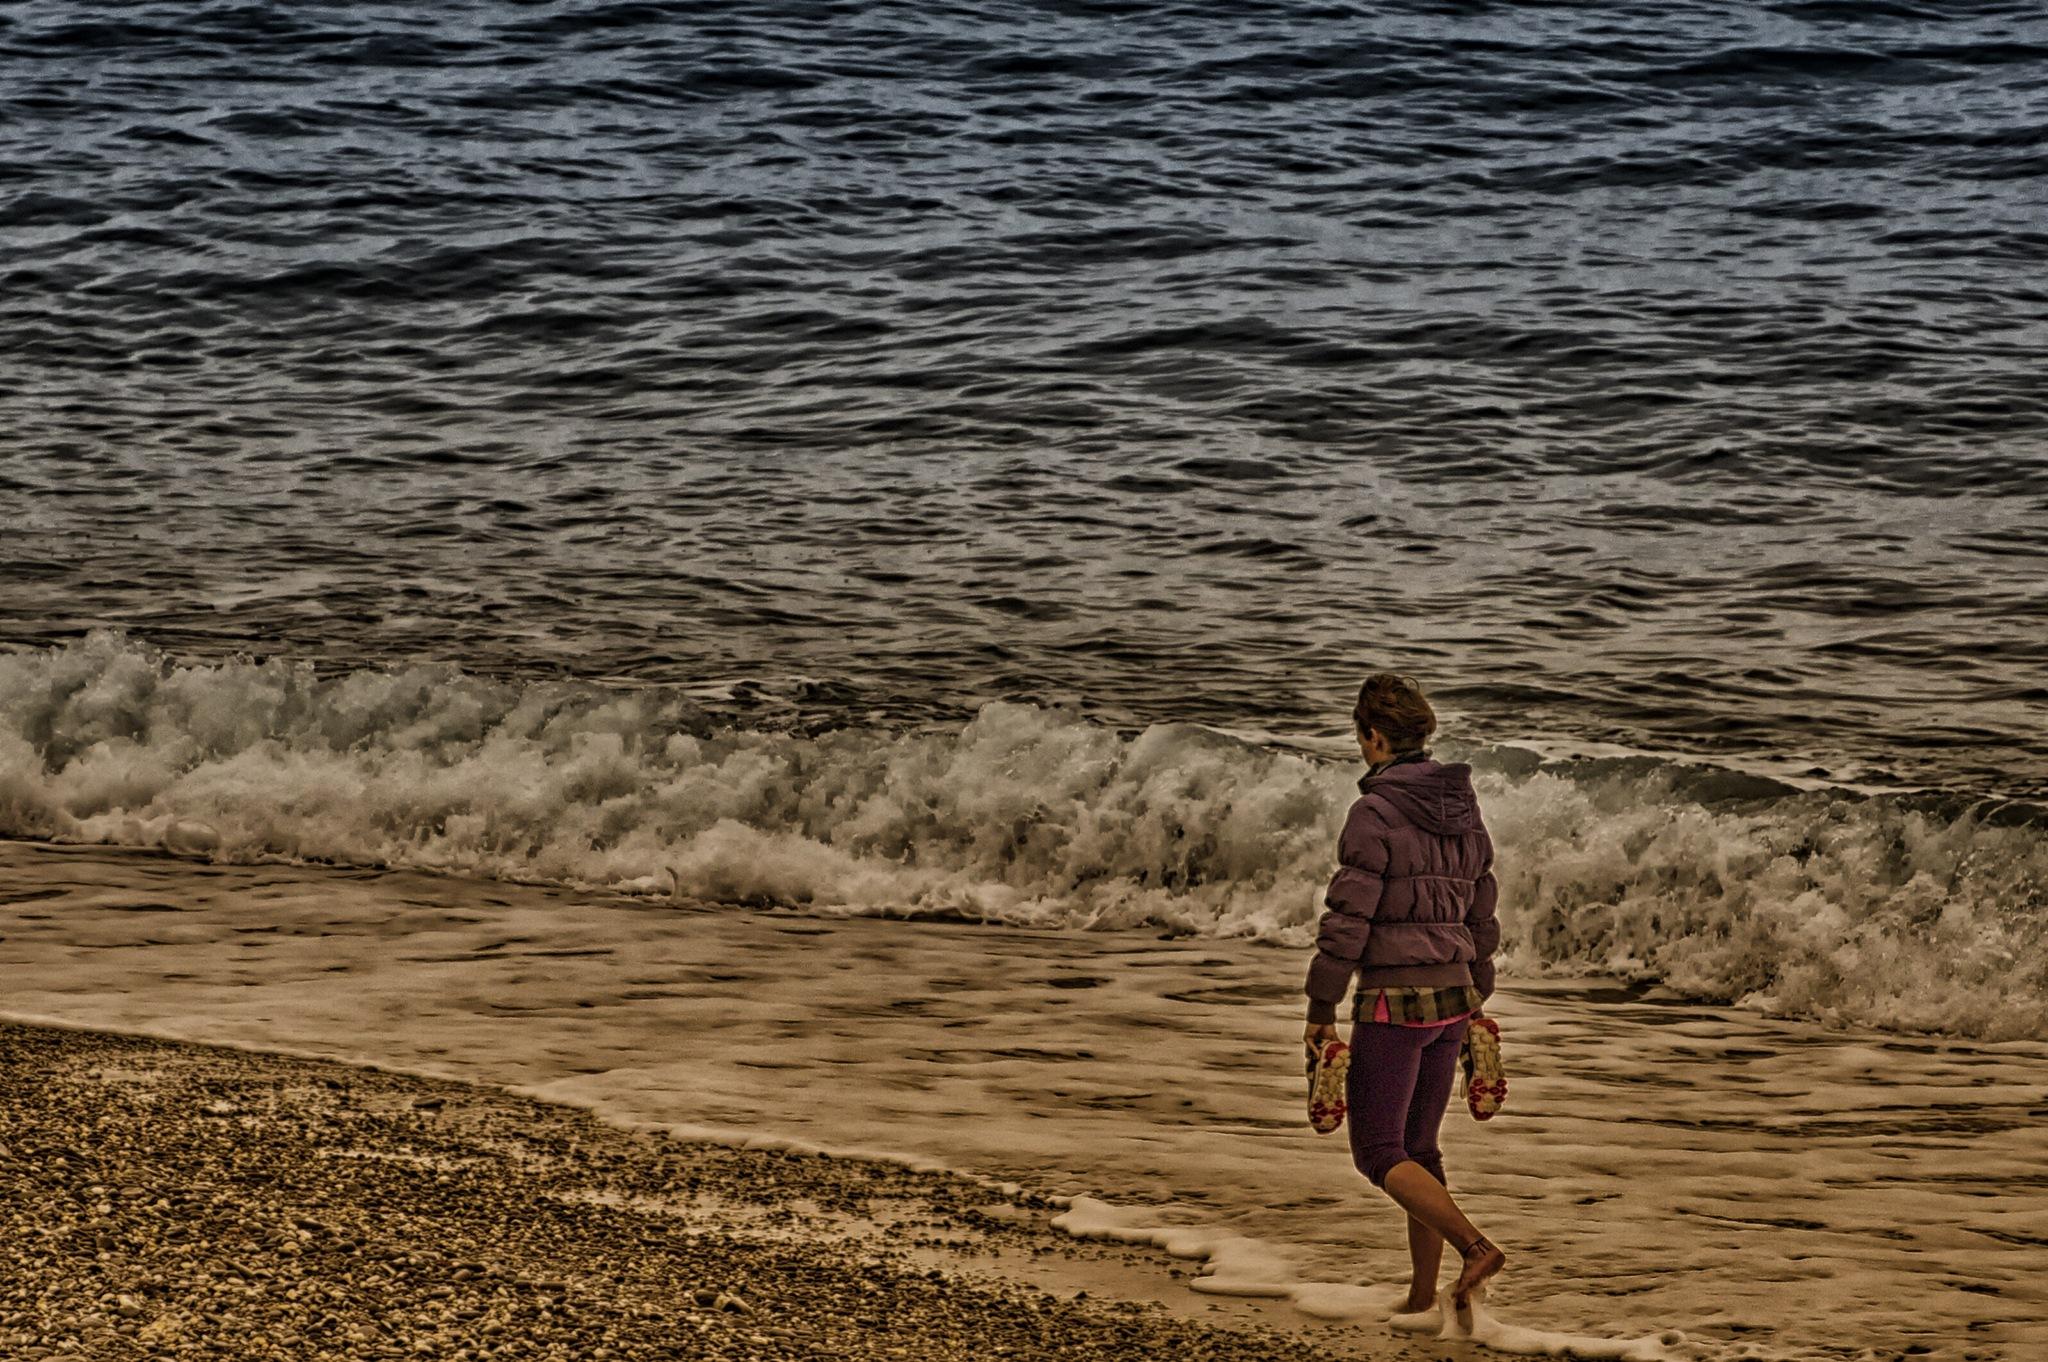 strolling on the sea shore by sunrisesunset